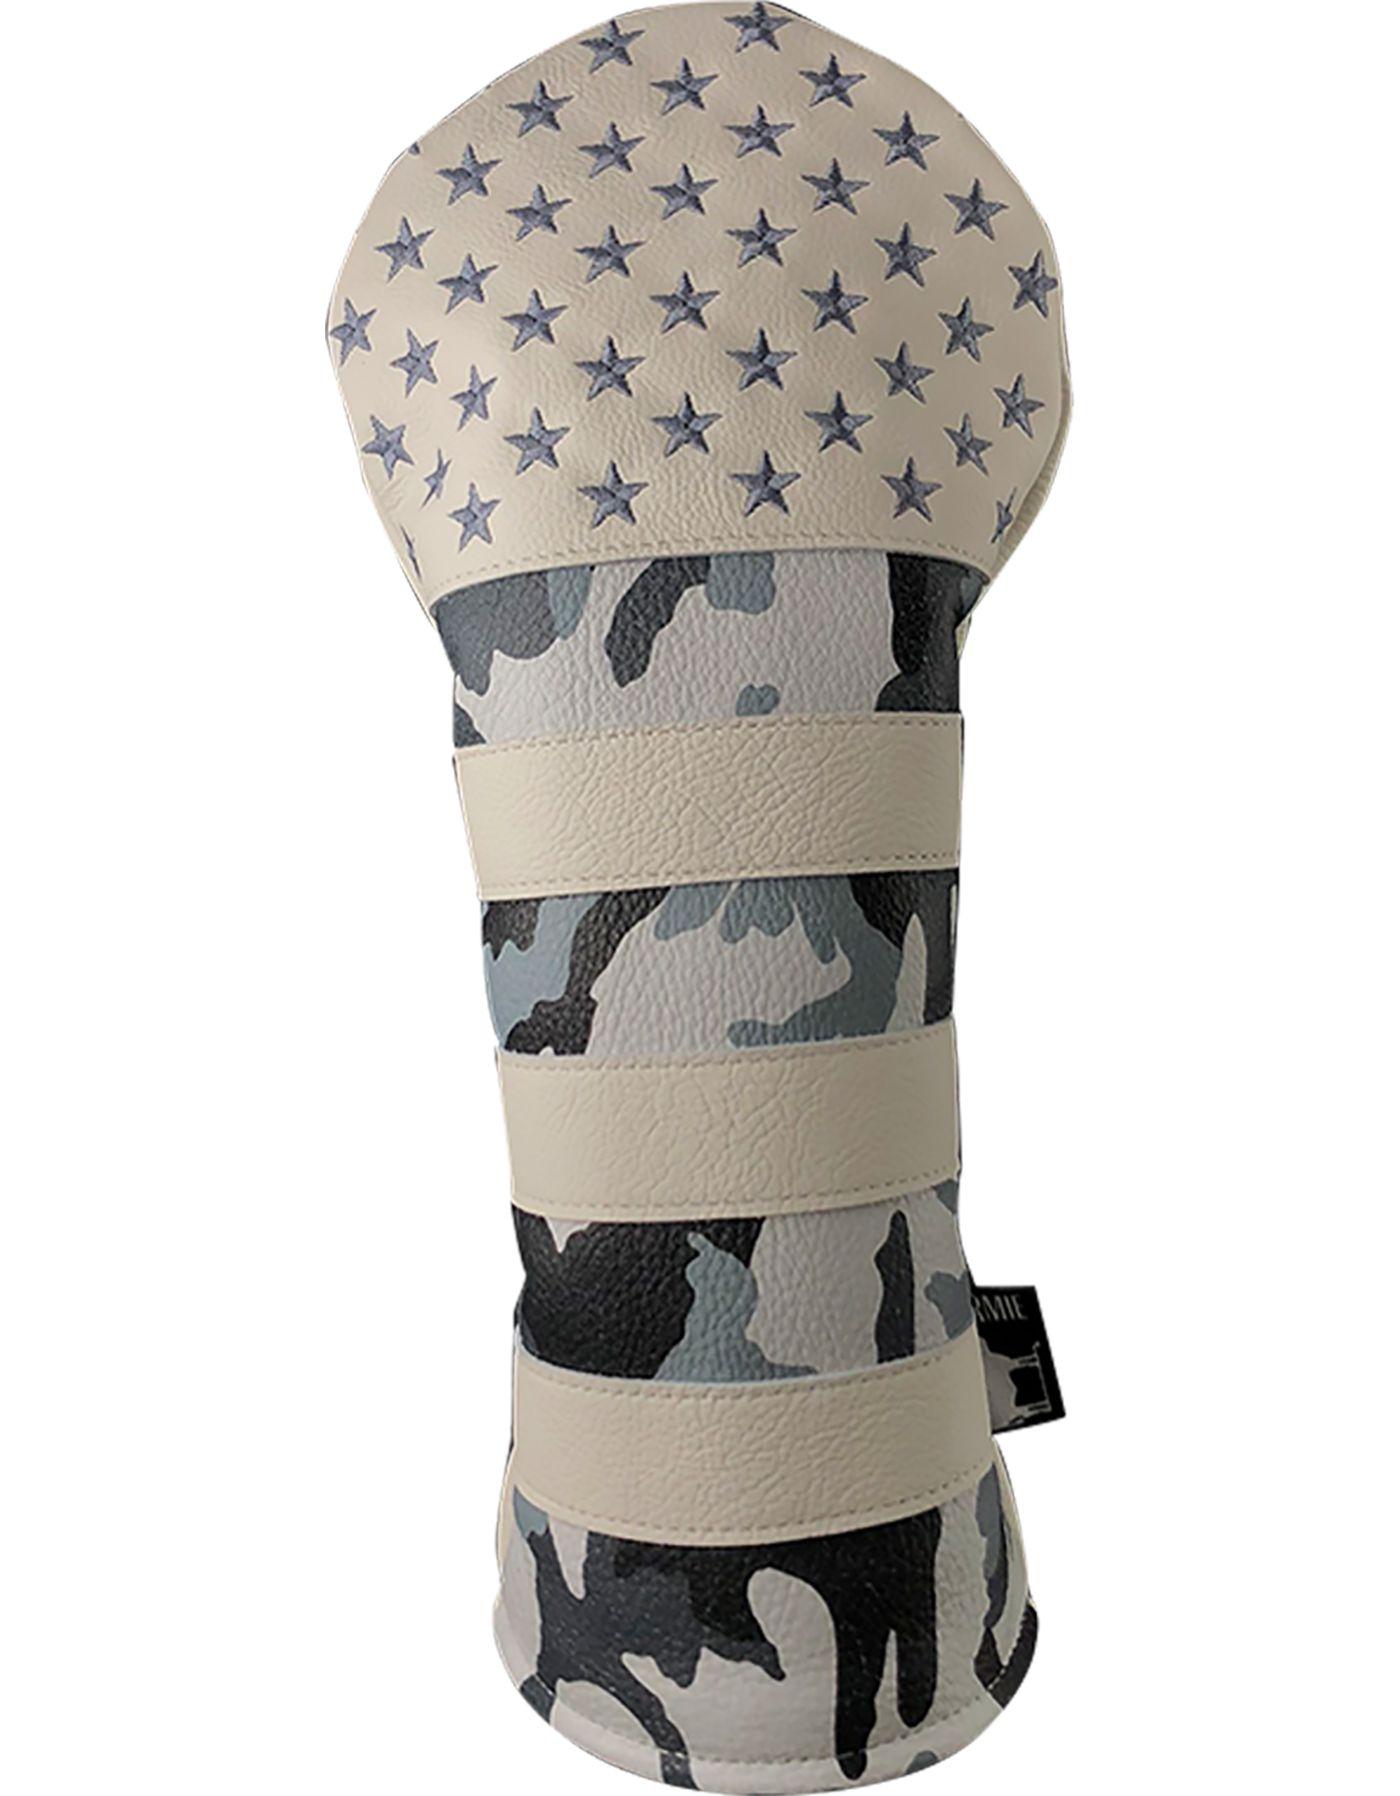 Dormie Workshop Storm Trooper USA Driver Headcover